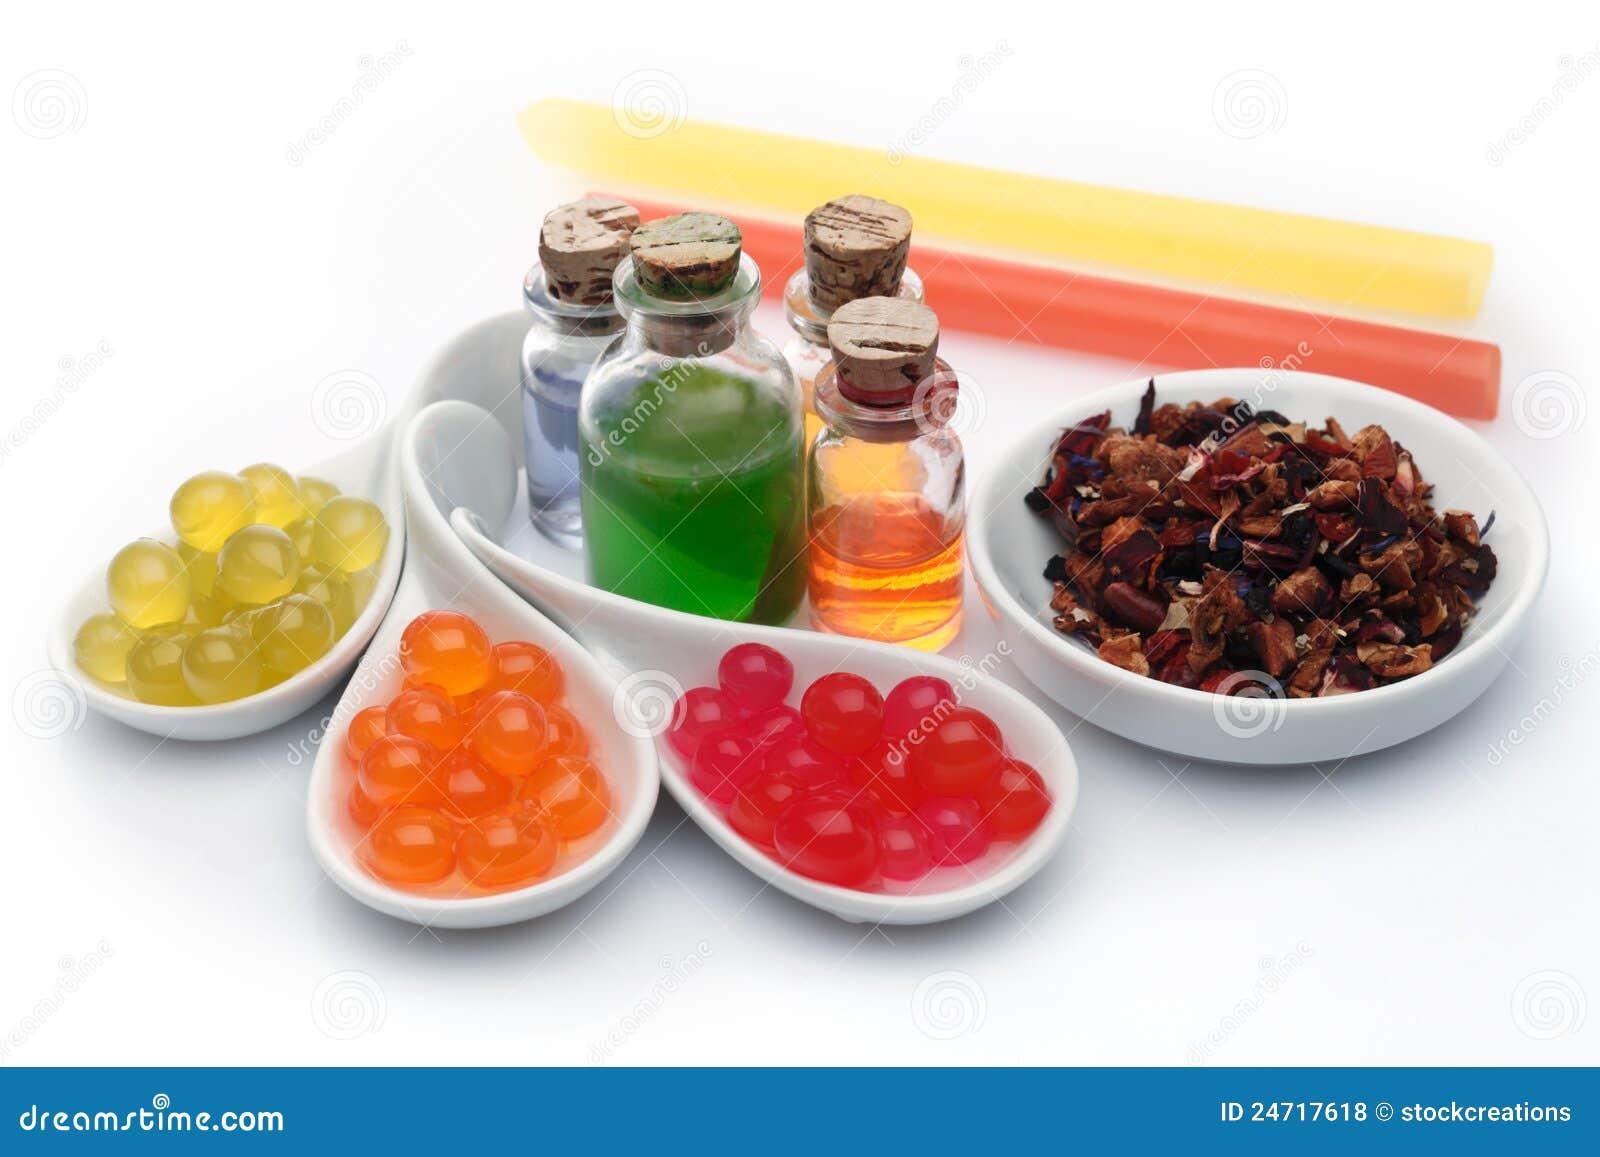 Bubble tea ingredients